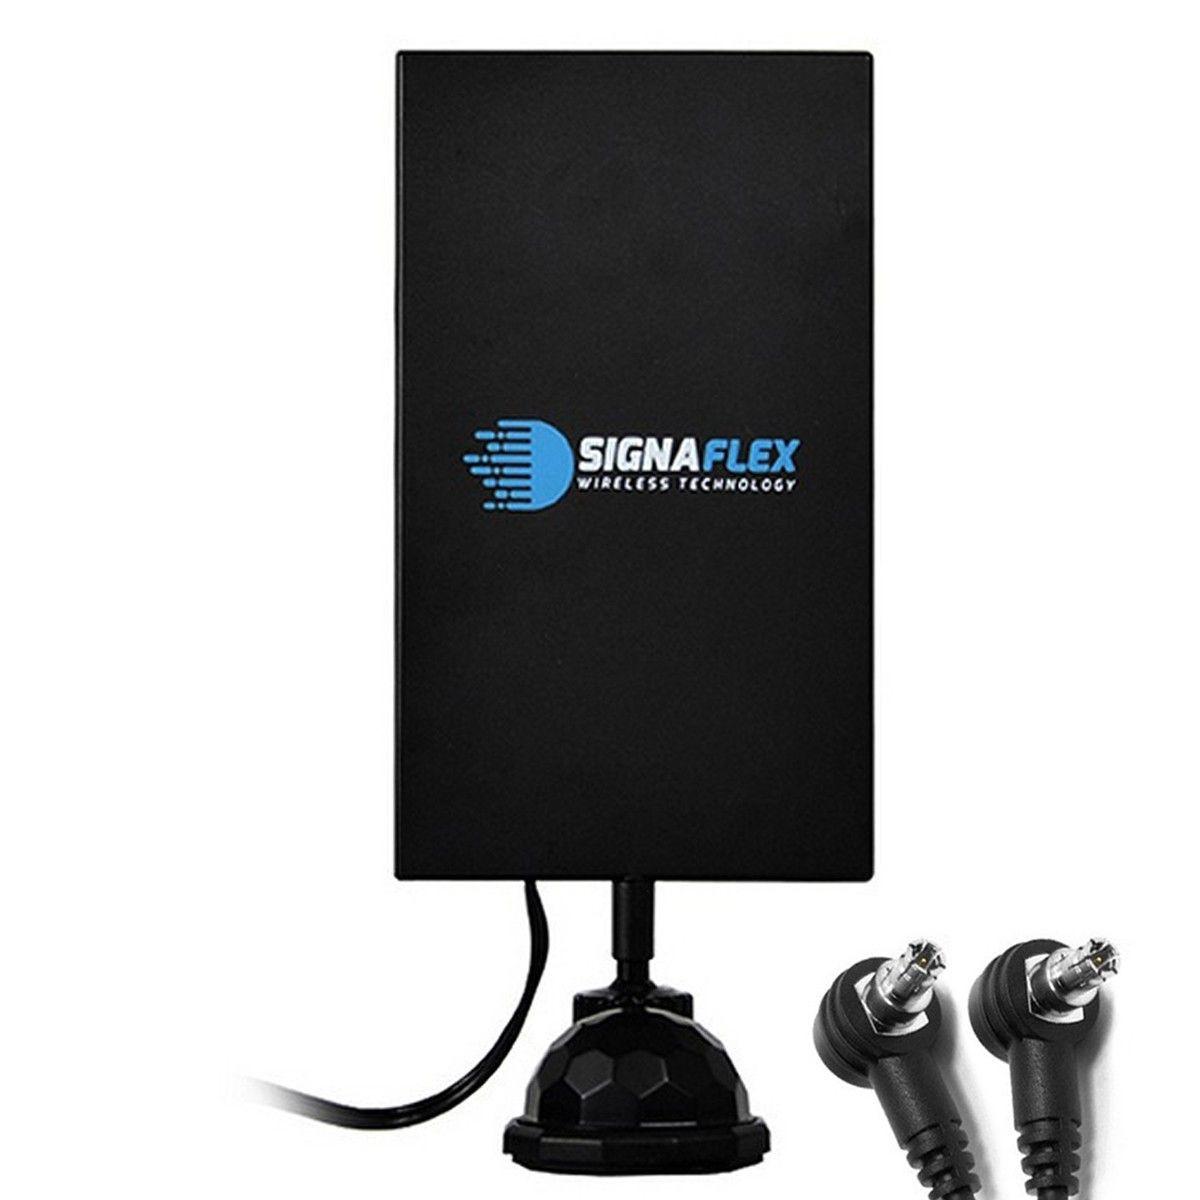 Antena mimo LTE DIAMENT 2x22dbi 2x3m 2xTS9